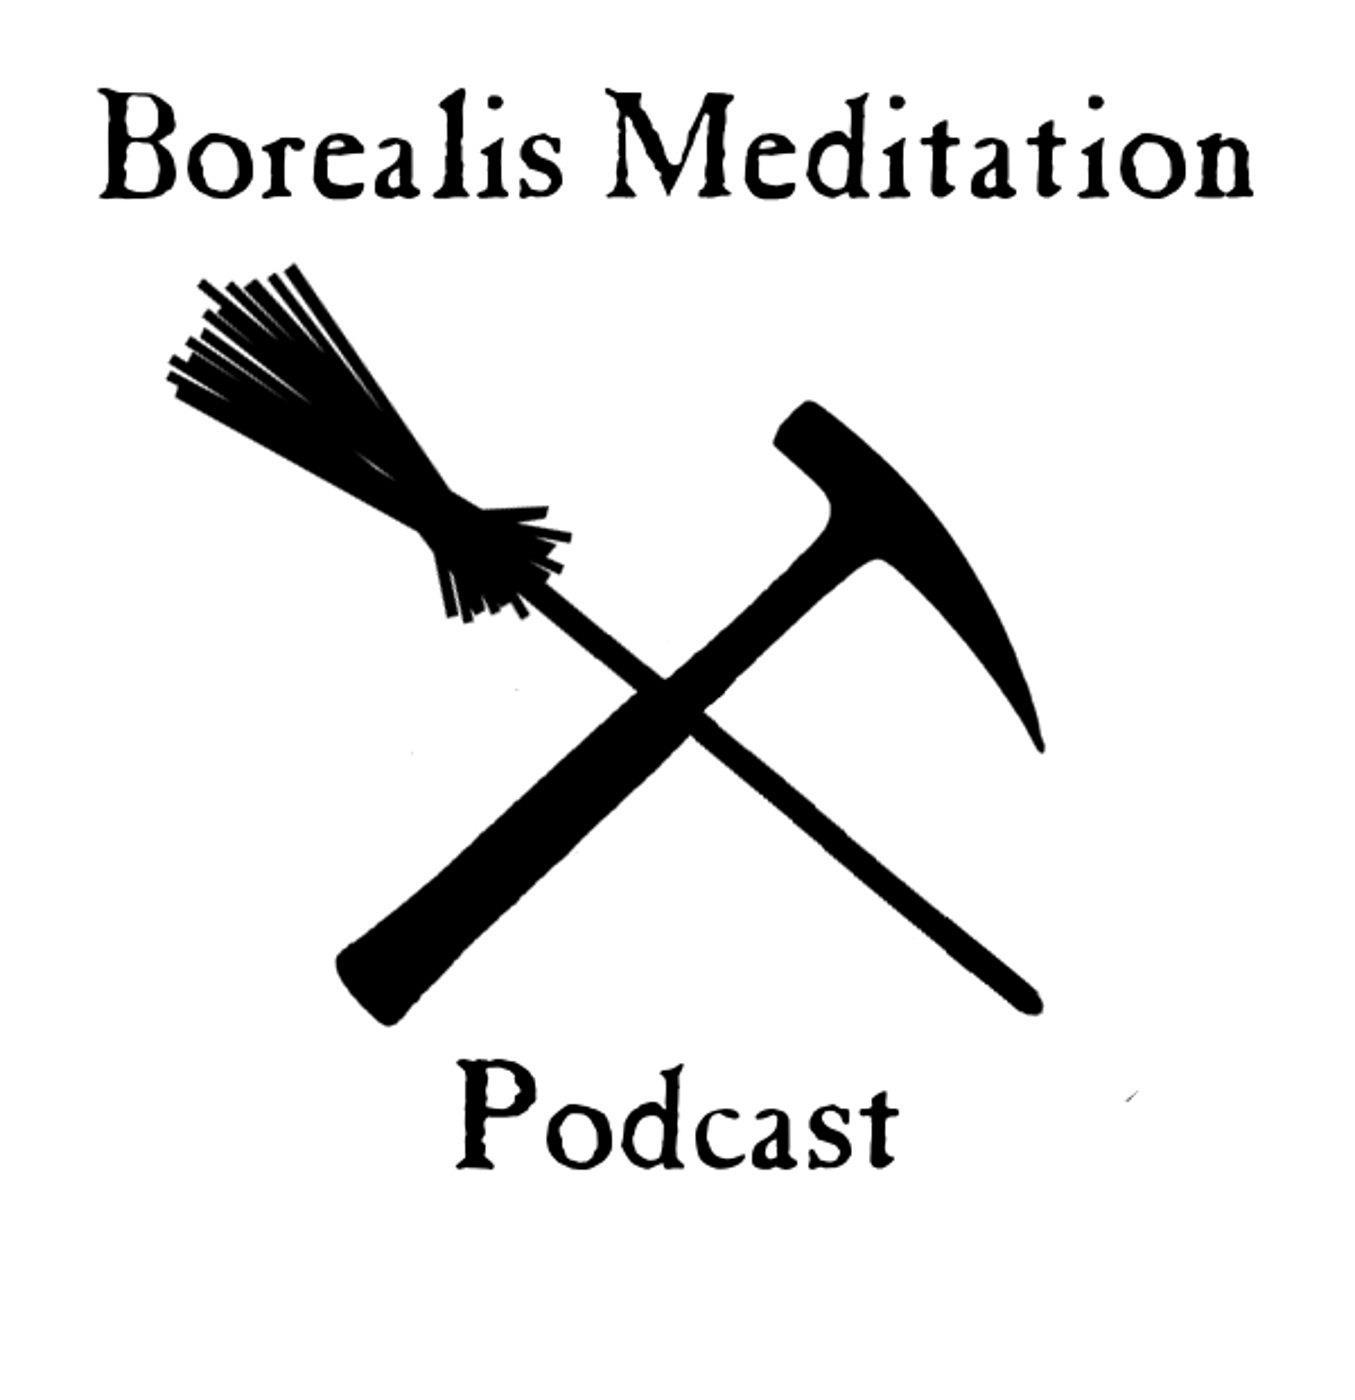 Borealis Meditation Podcast show art